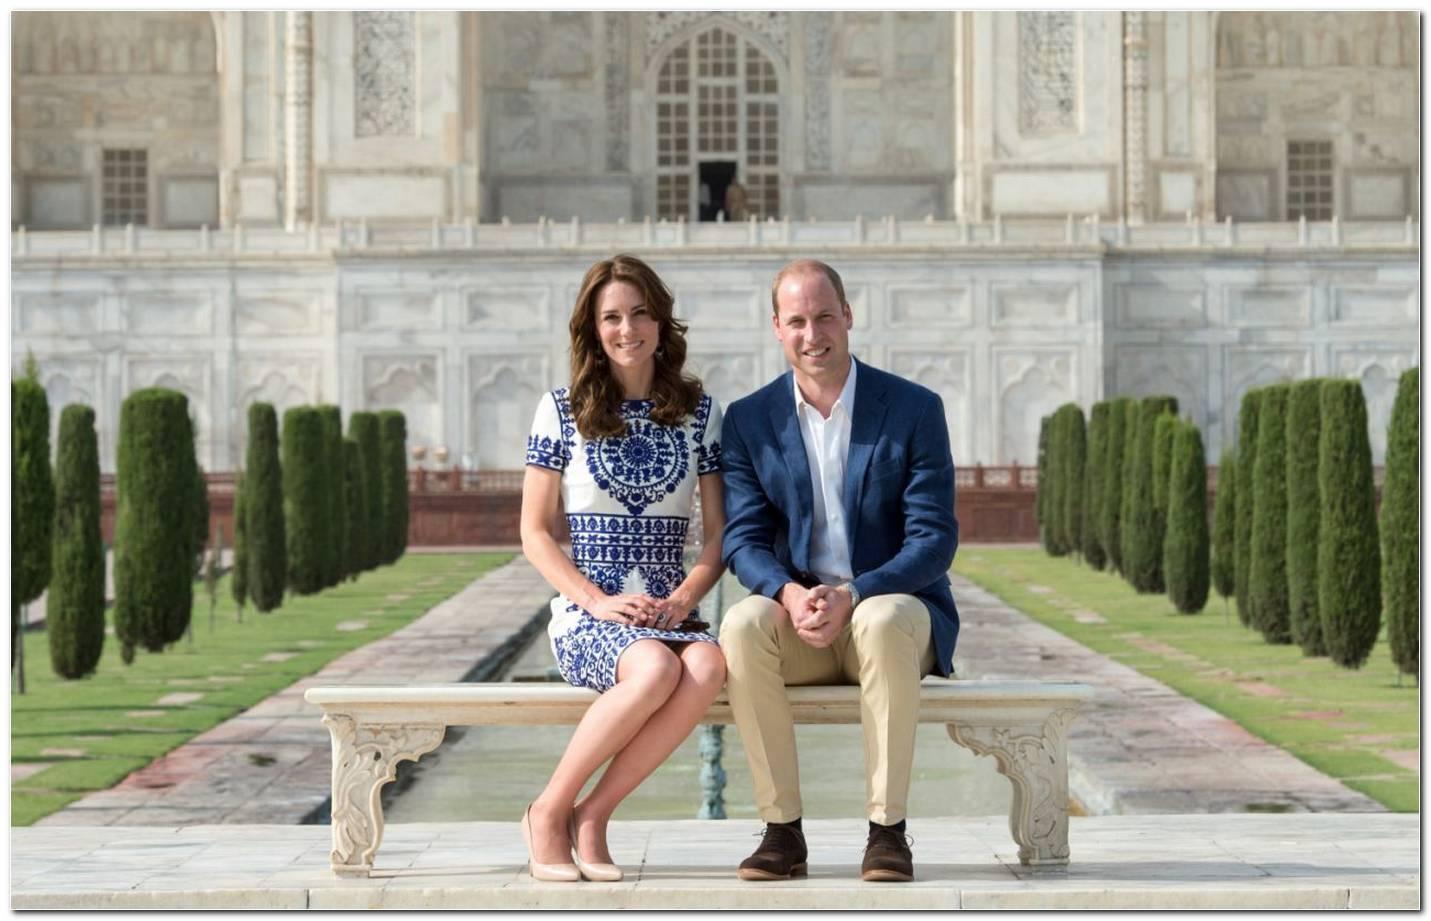 Kate Middleton Frisur